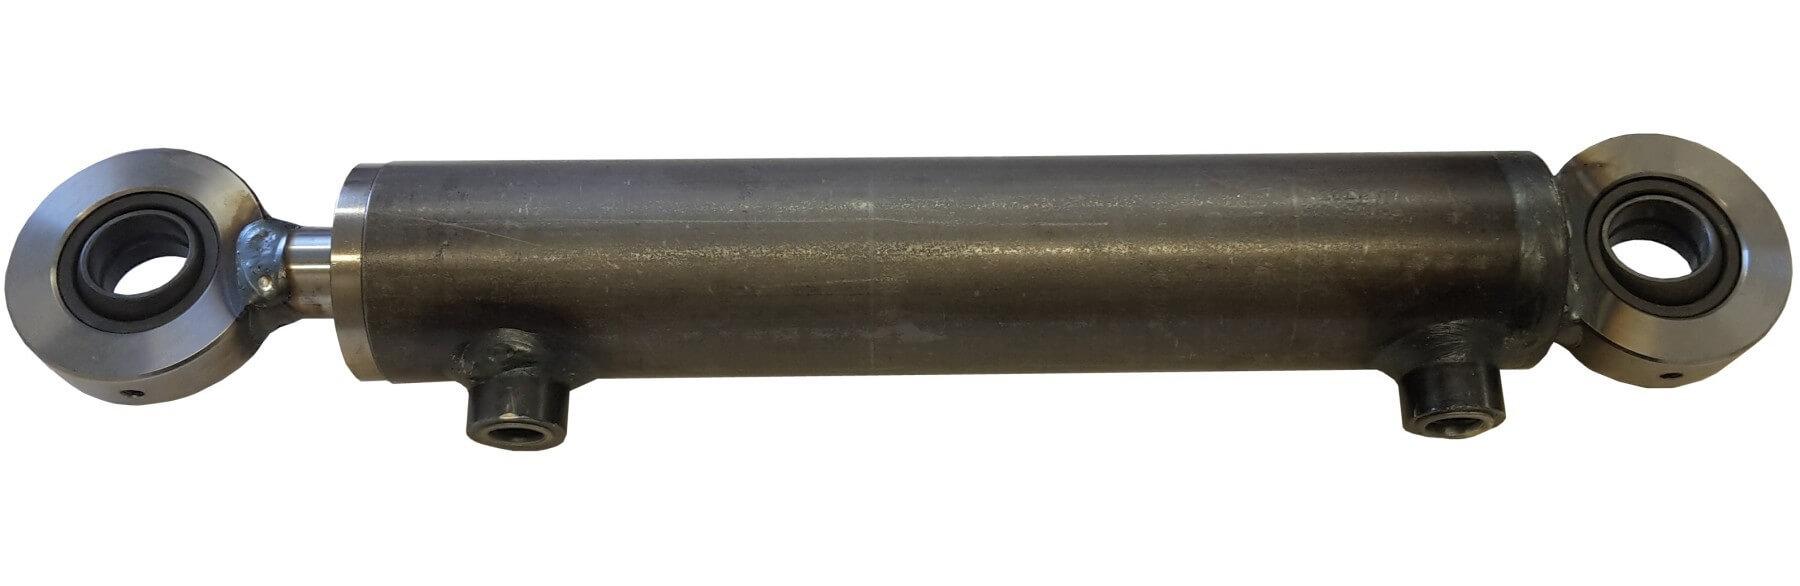 Hydraulisylinteri CL 50. 25. 800 GE